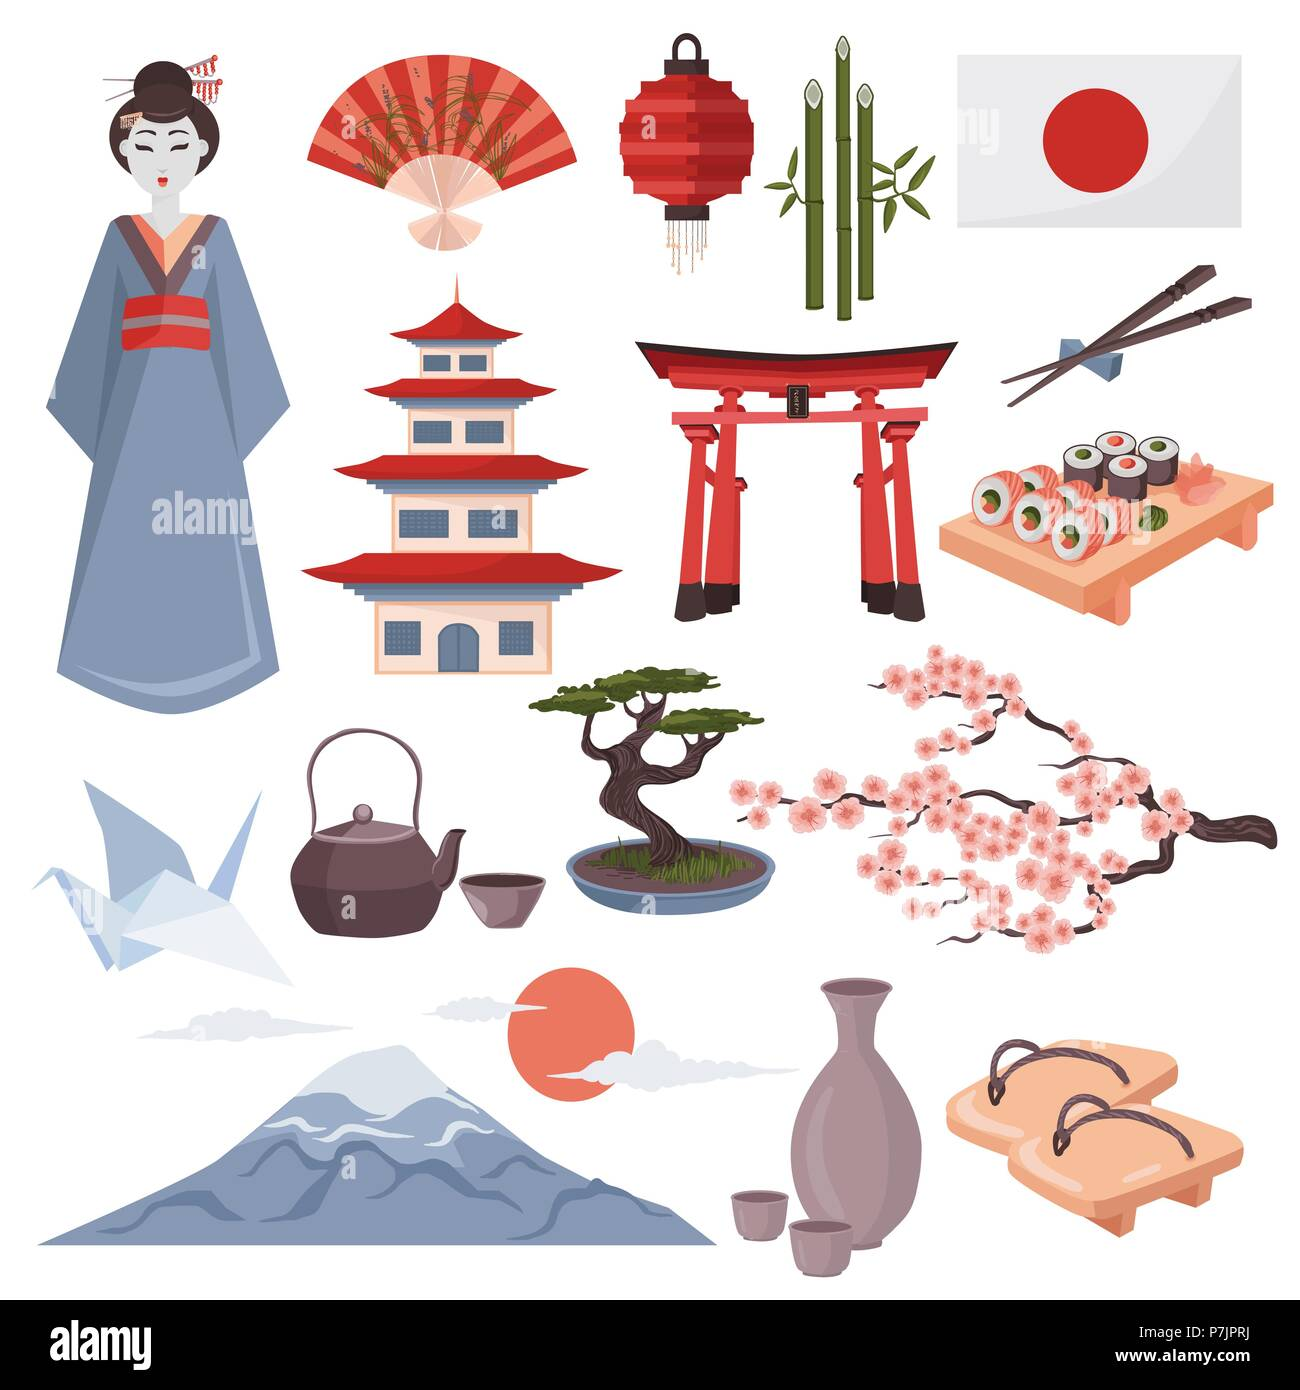 Japanese symbols vector illustration.  Colorful set of Japan culture icons isolated on white background. Torii, Fujiyama, Japanese temple etc. Stock Vector